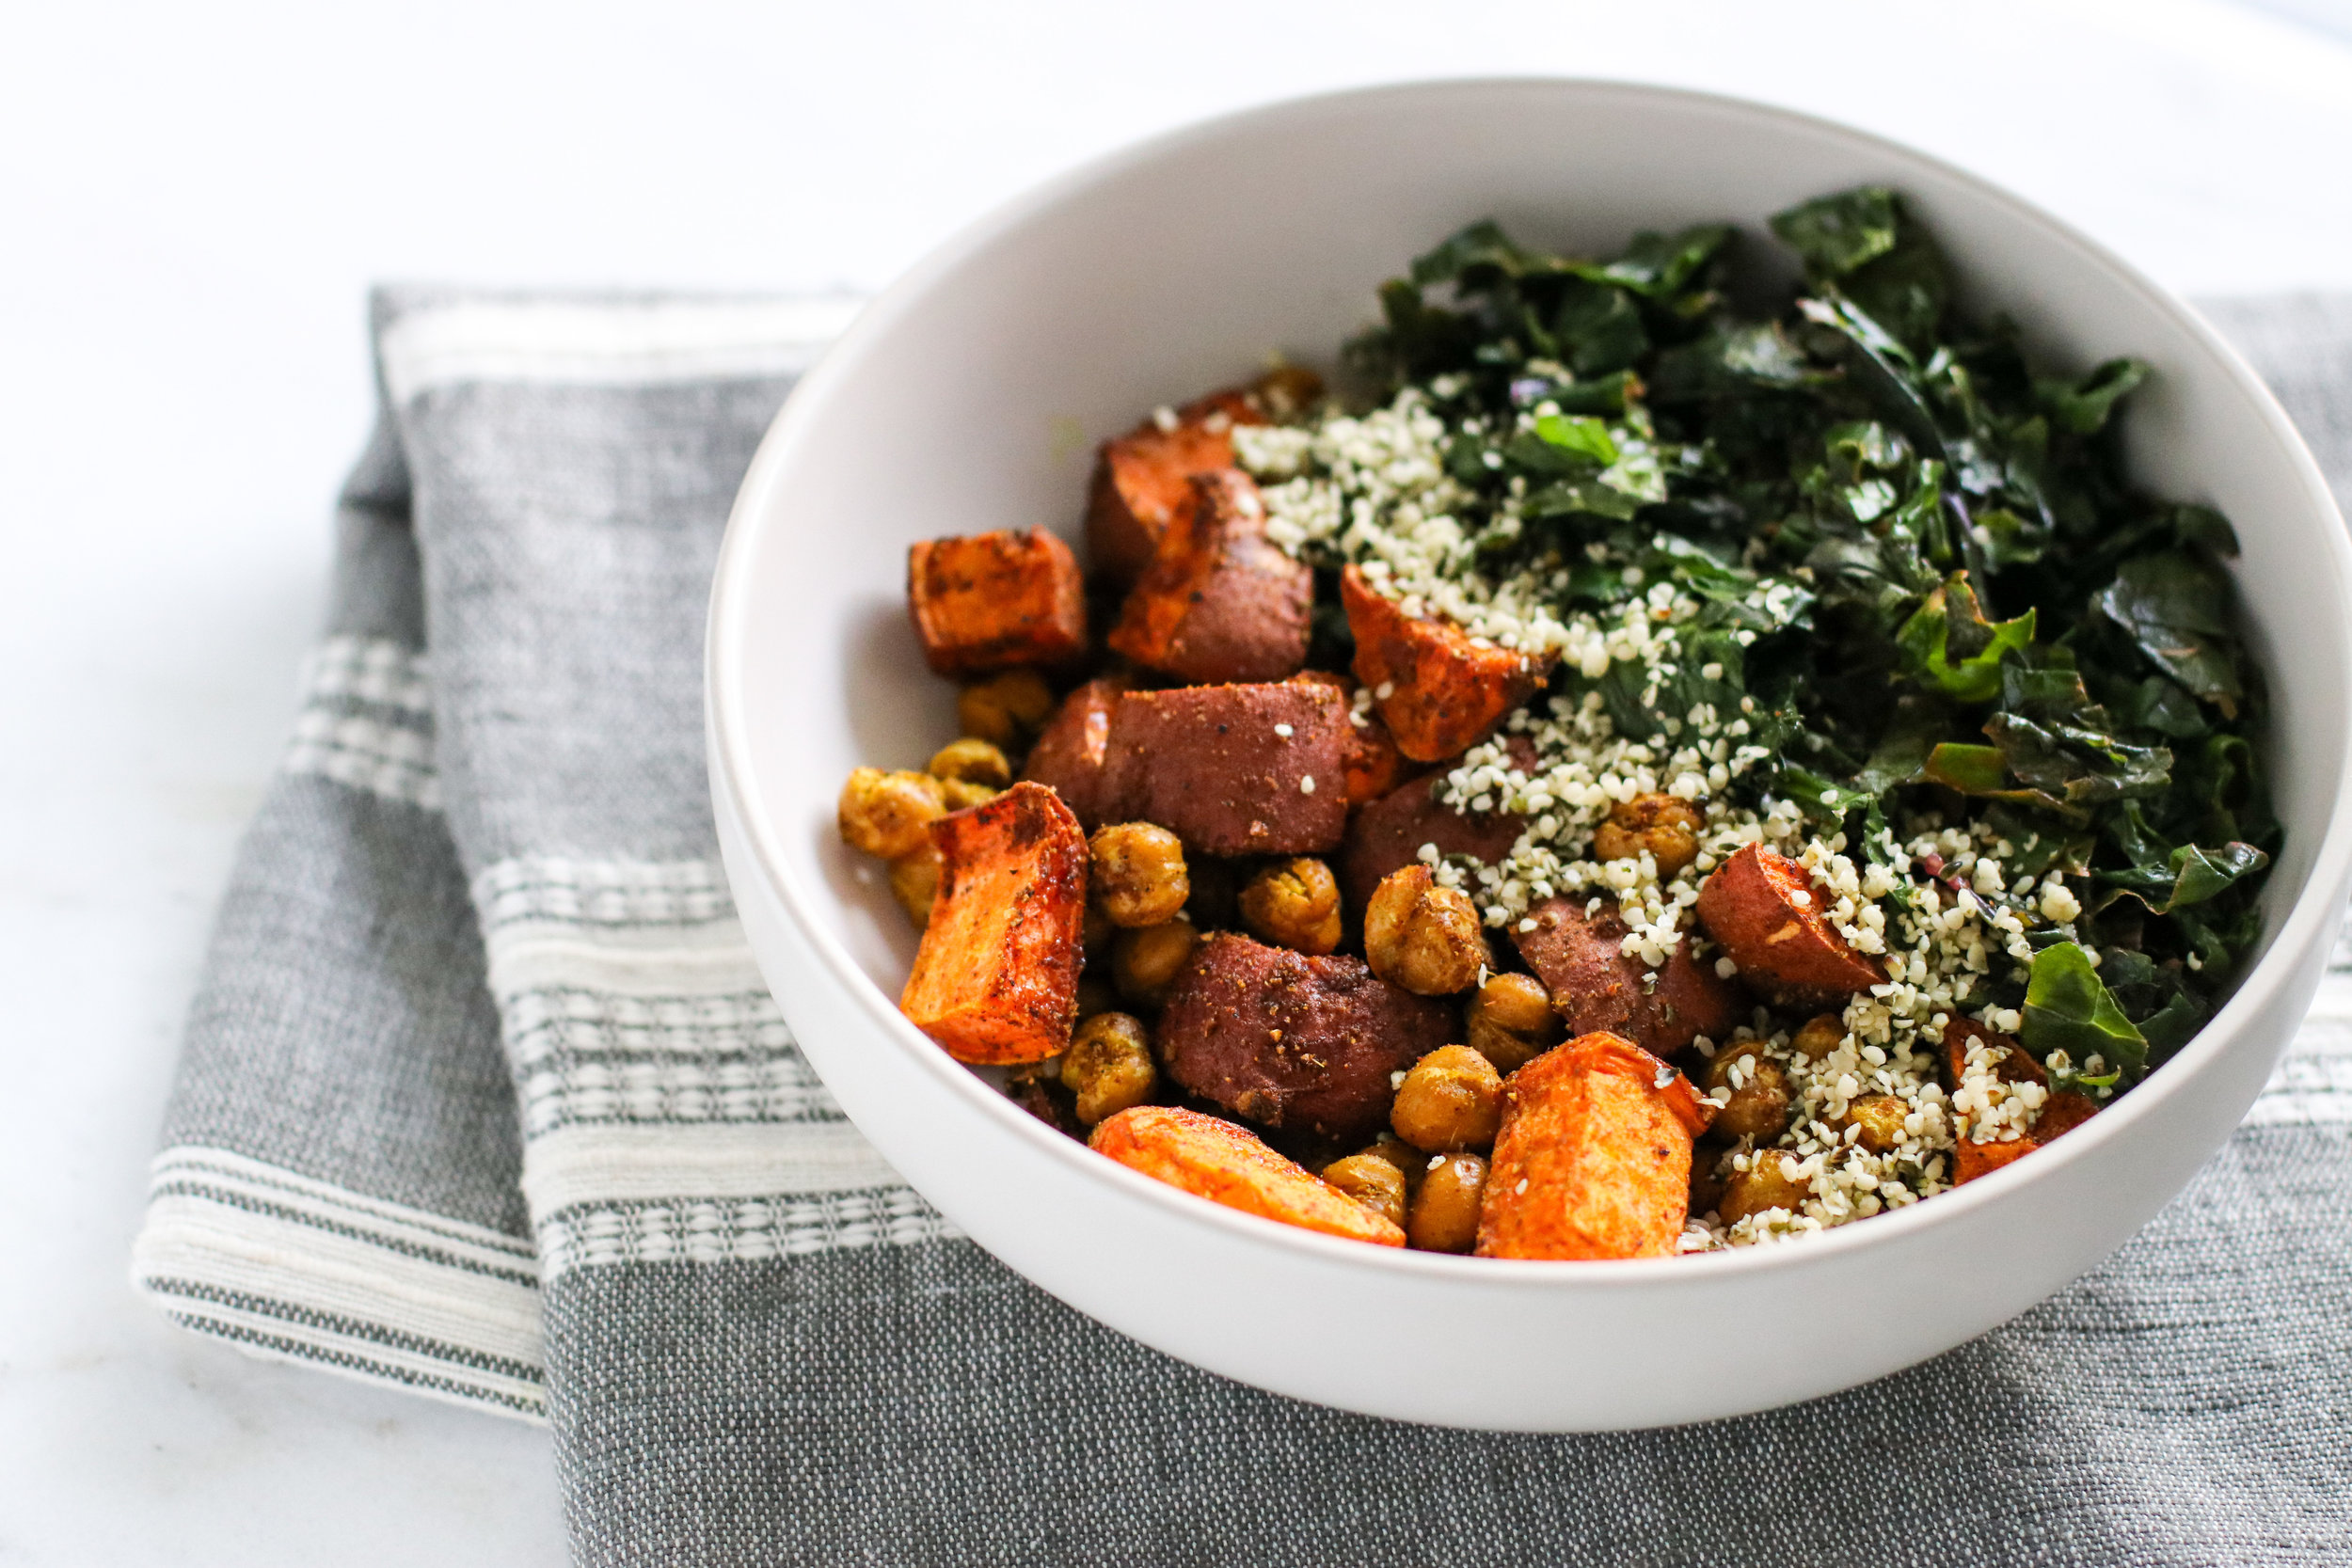 Cumin + Coriander Roasted Sweet Potatoes and Chickpeas over Quinoa with Sautéed Kale and Hemp Seeds